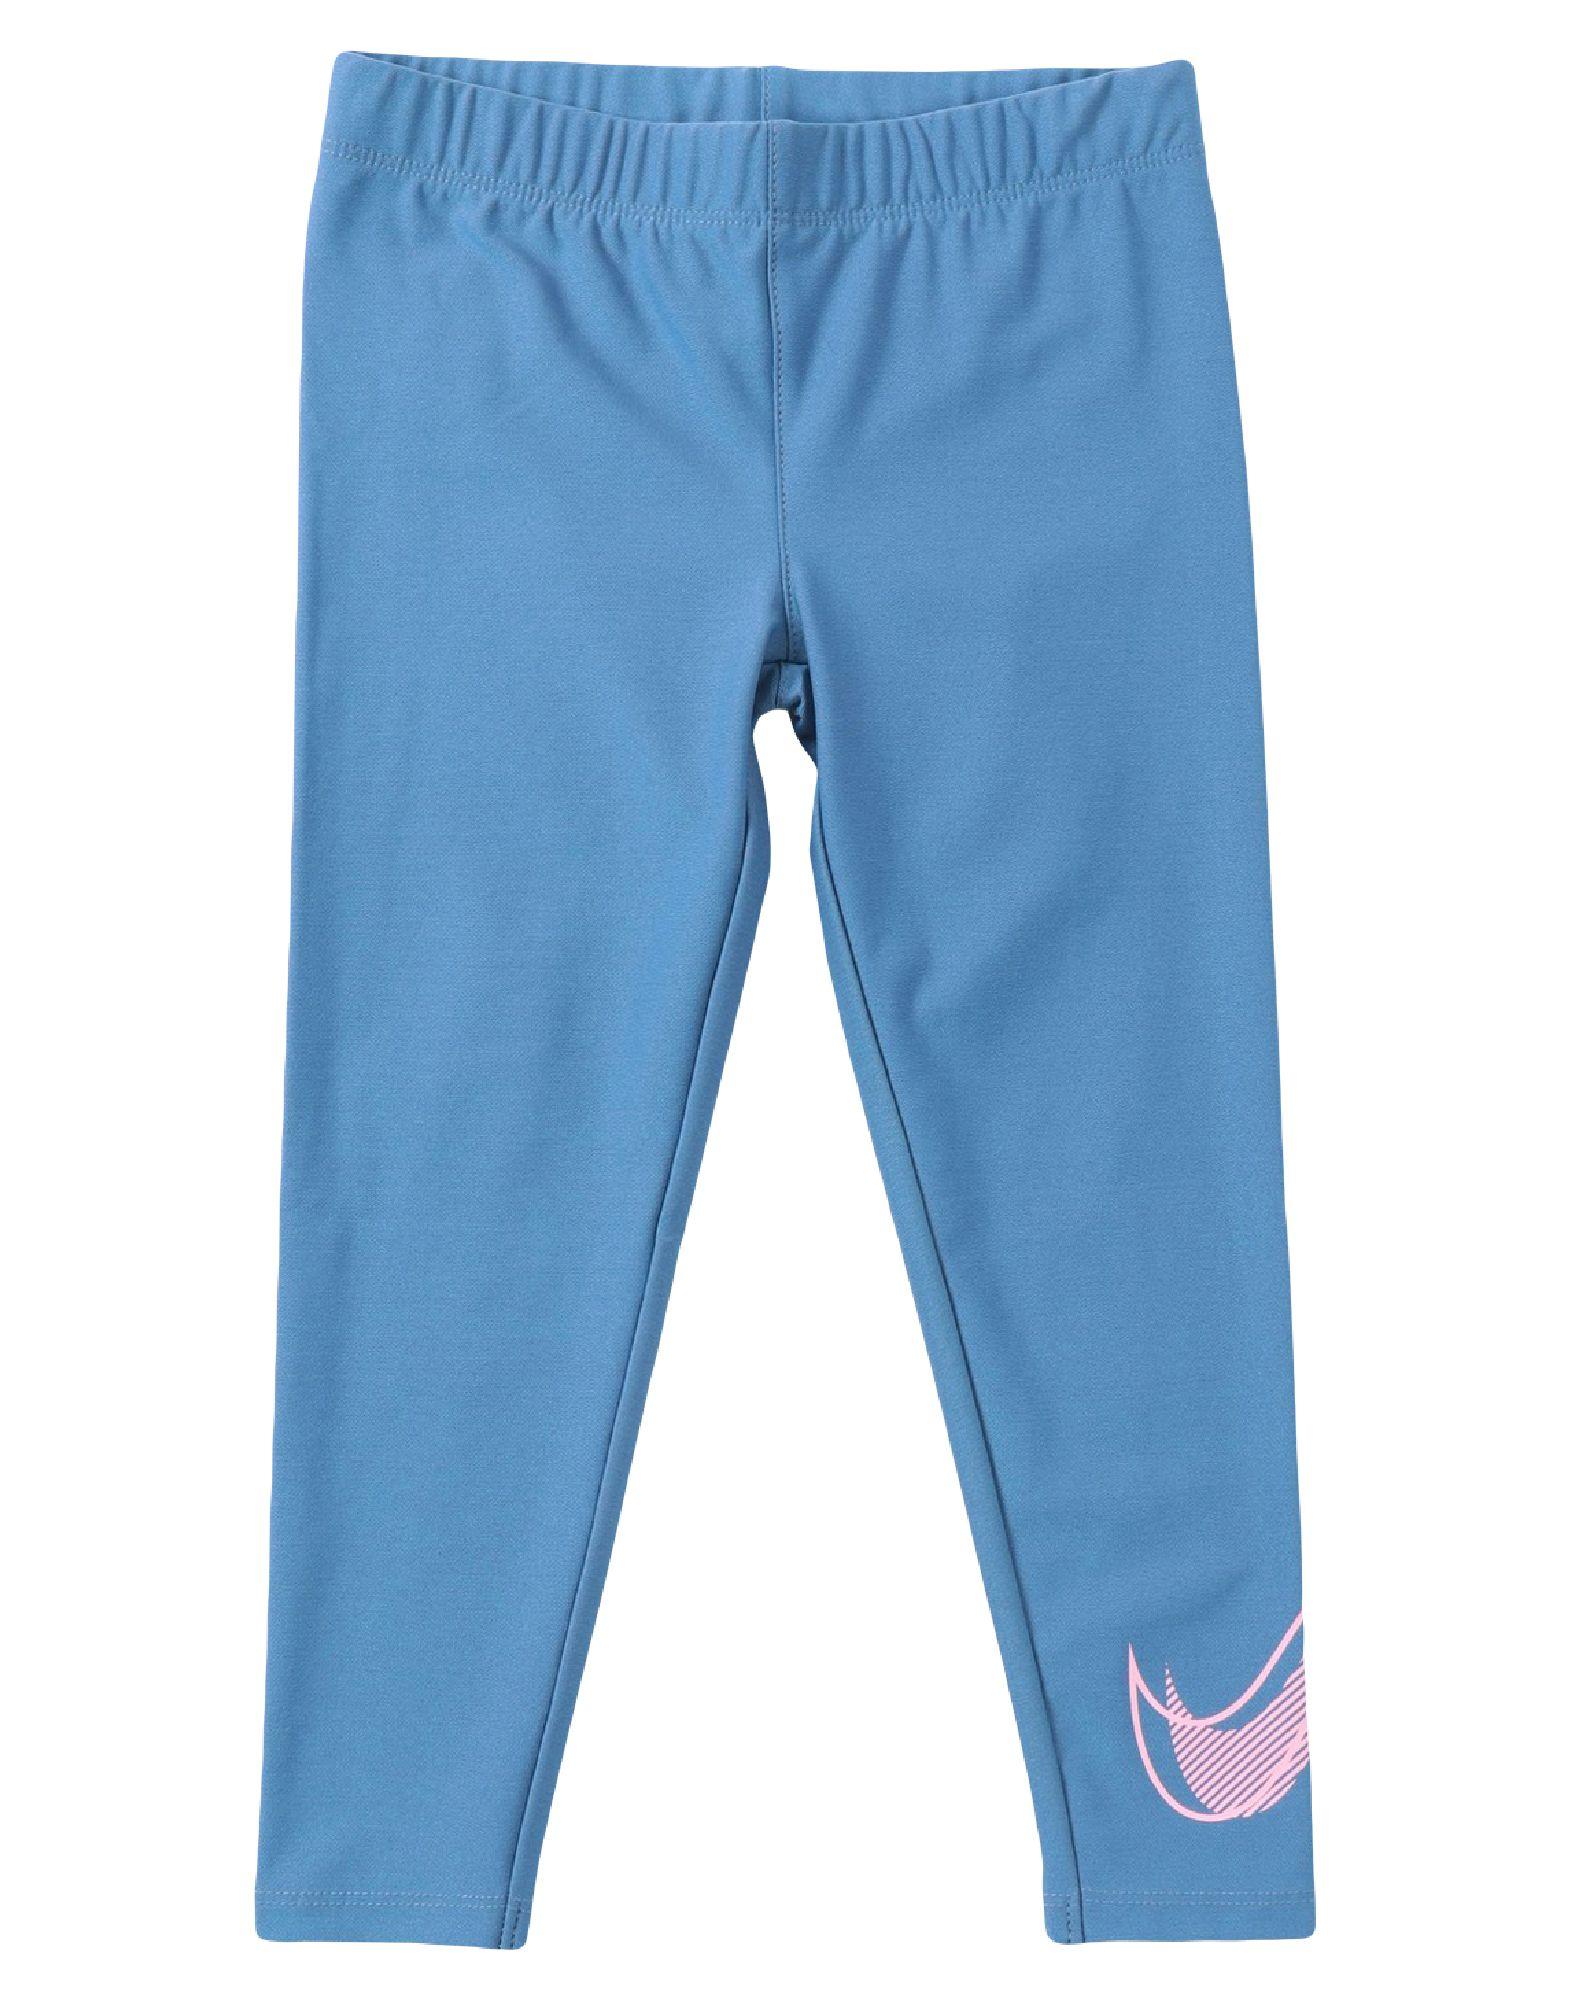 Nike Kids' Leggings In Blue